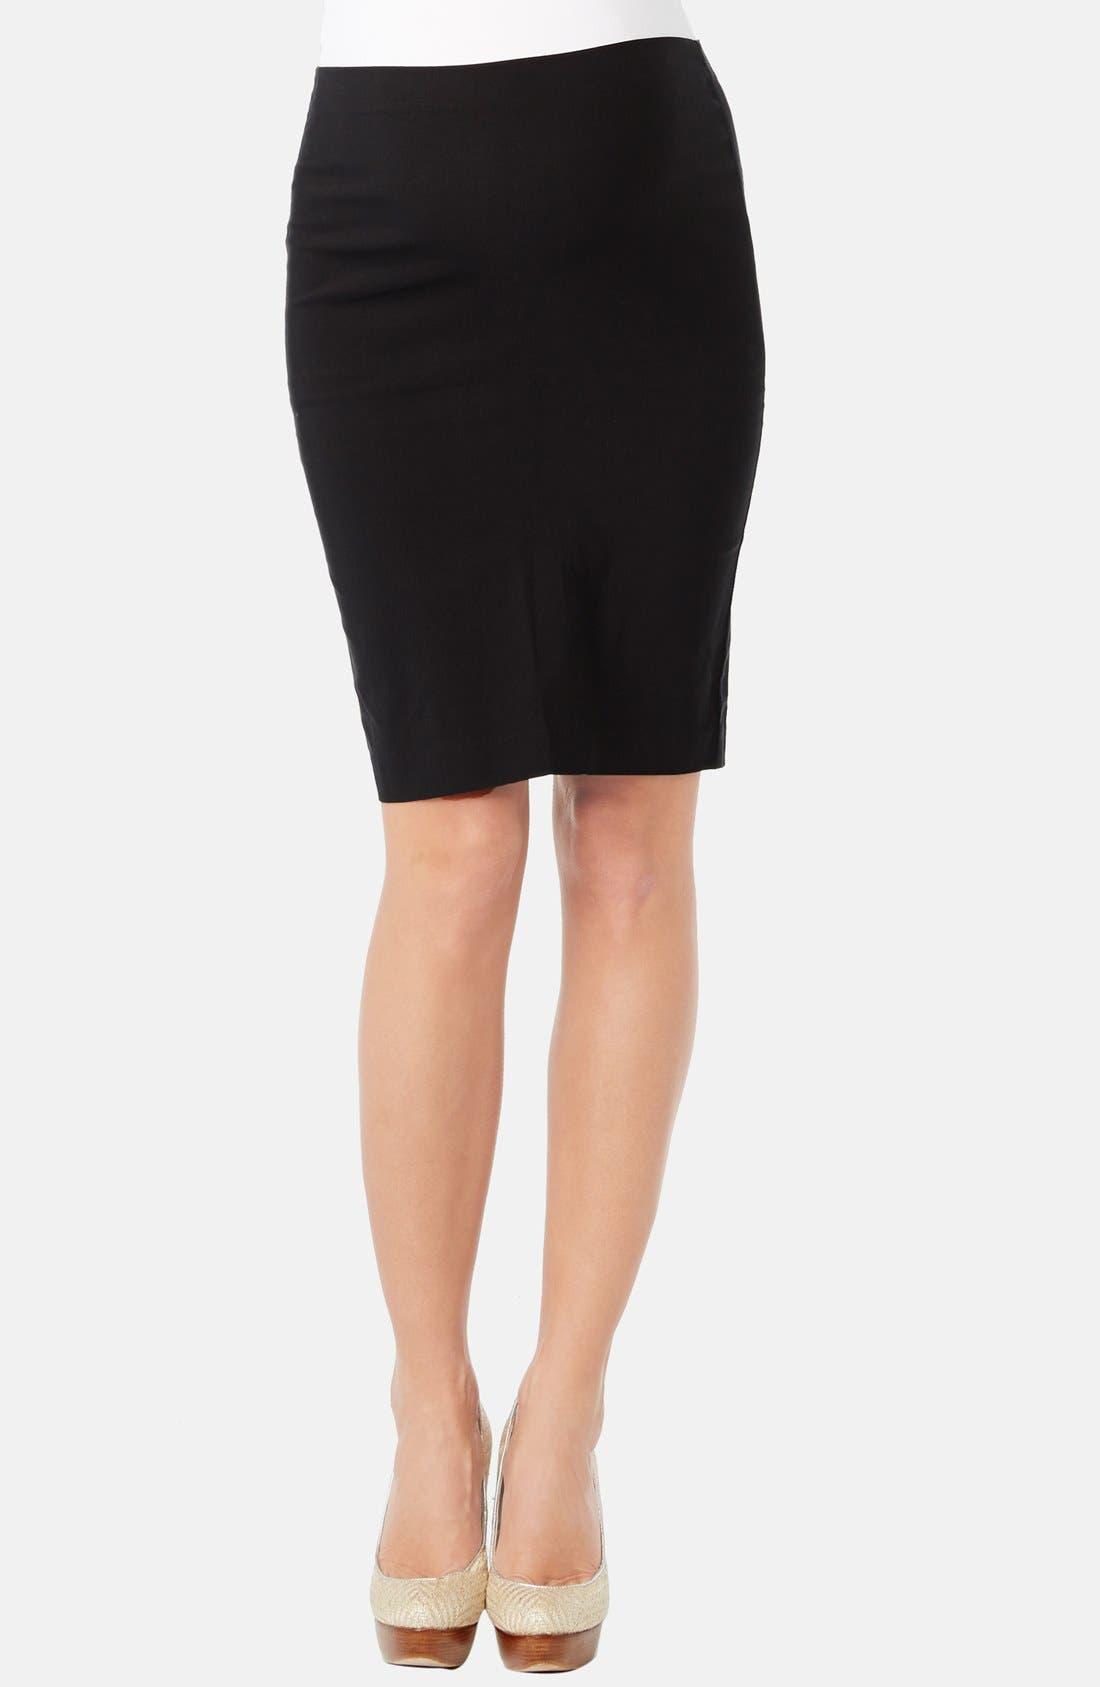 ROSIE POPE 'Pret' Maternity Skirt in Black